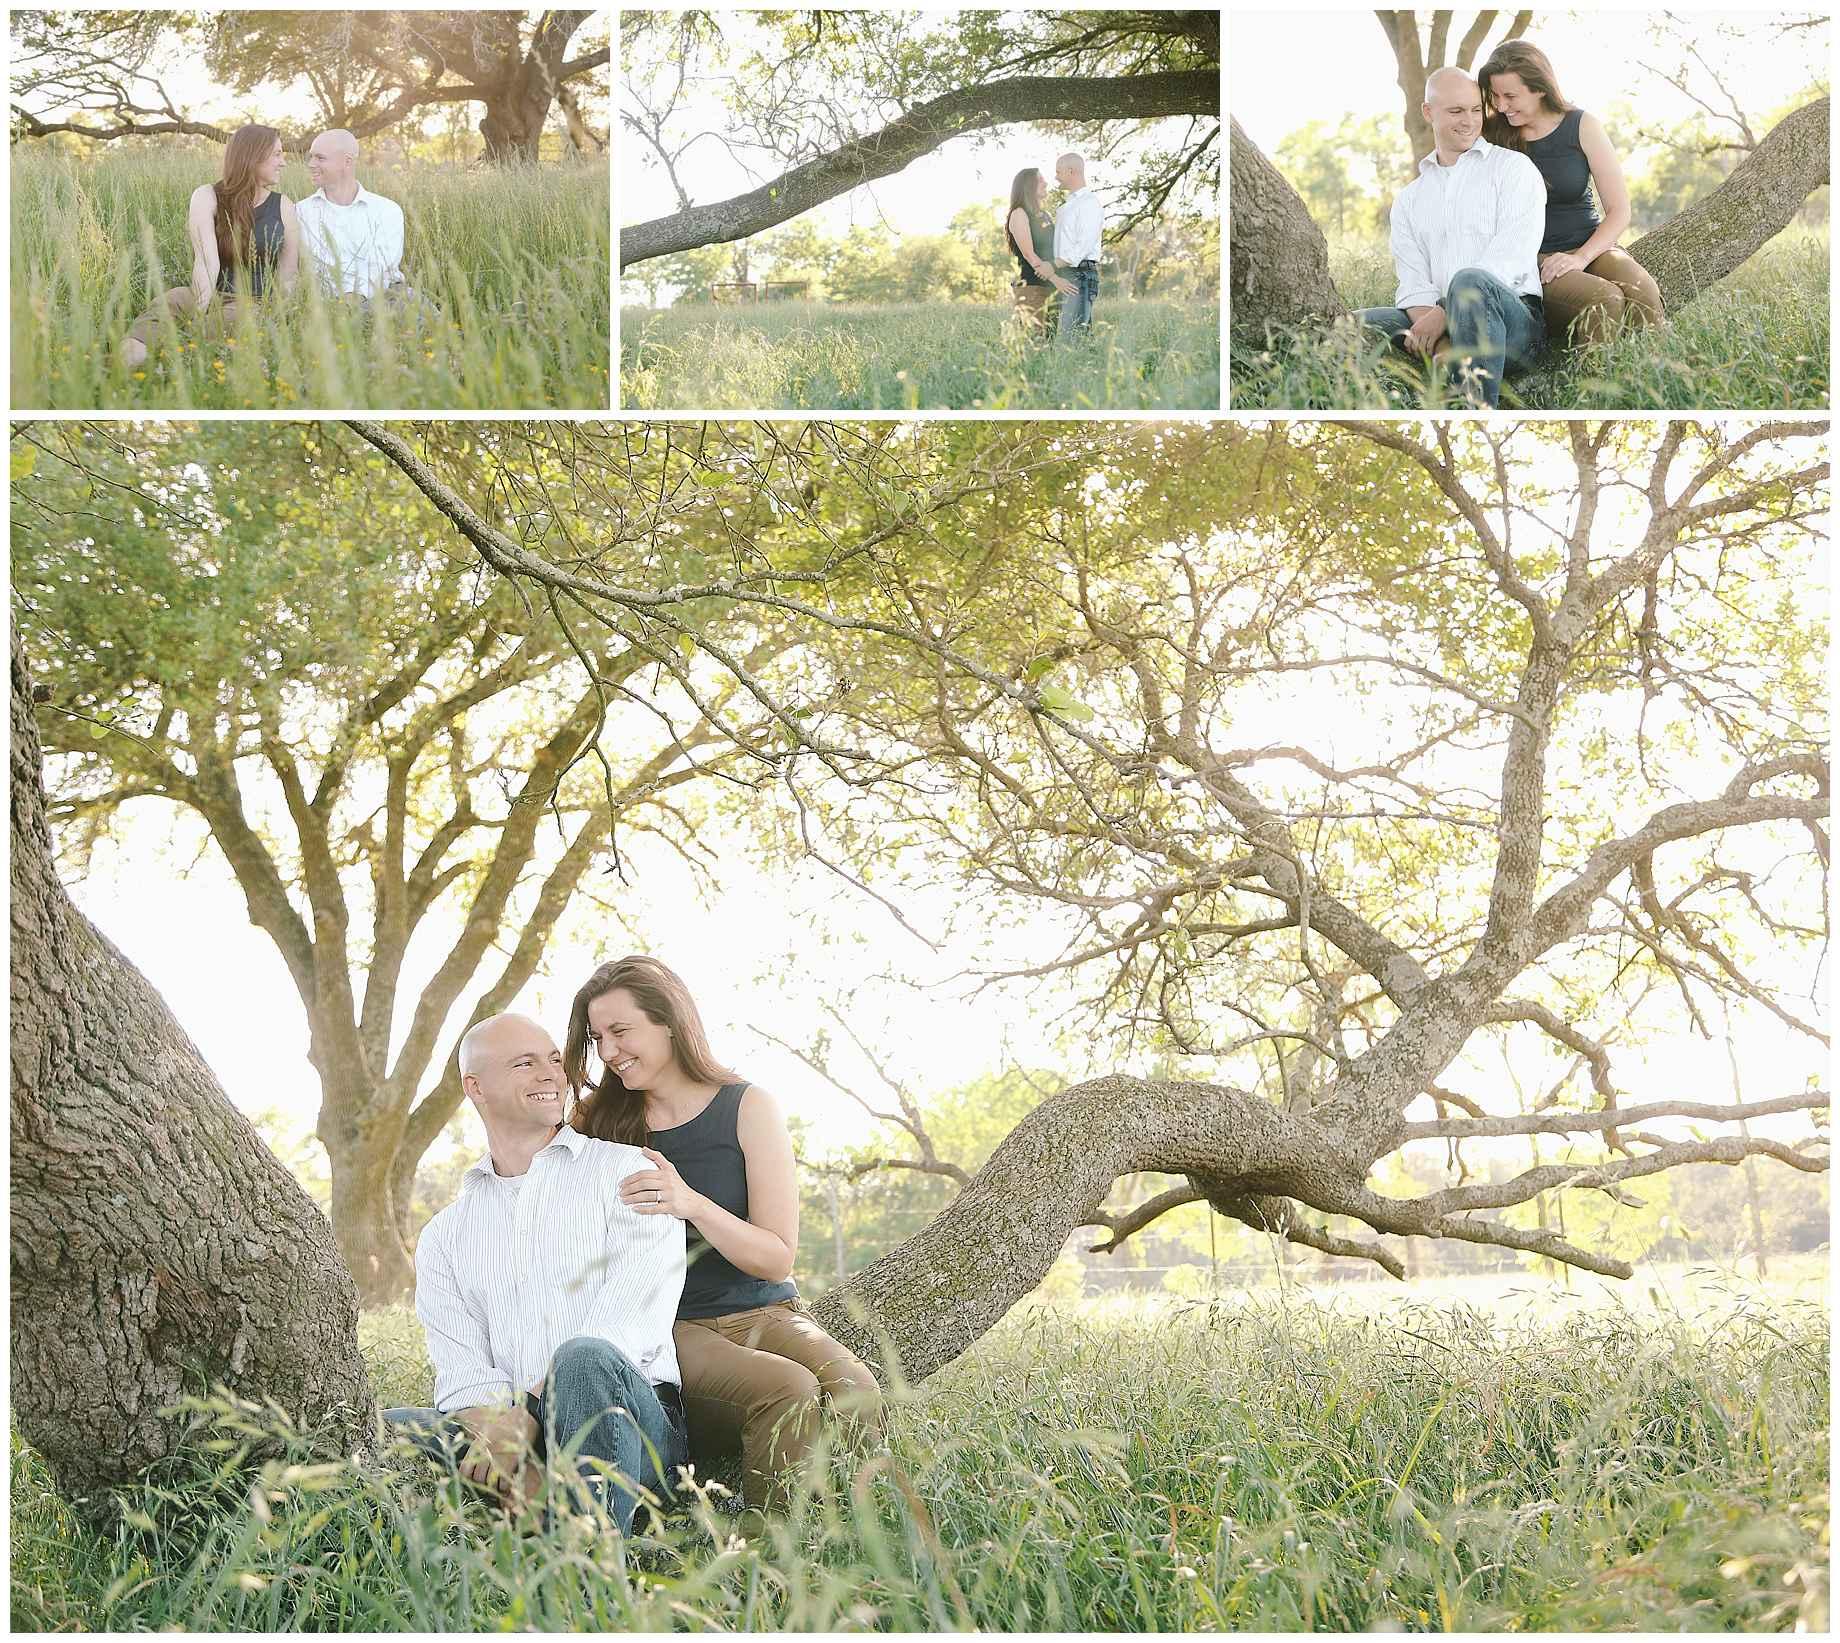 east-texas-engagement-photos-02